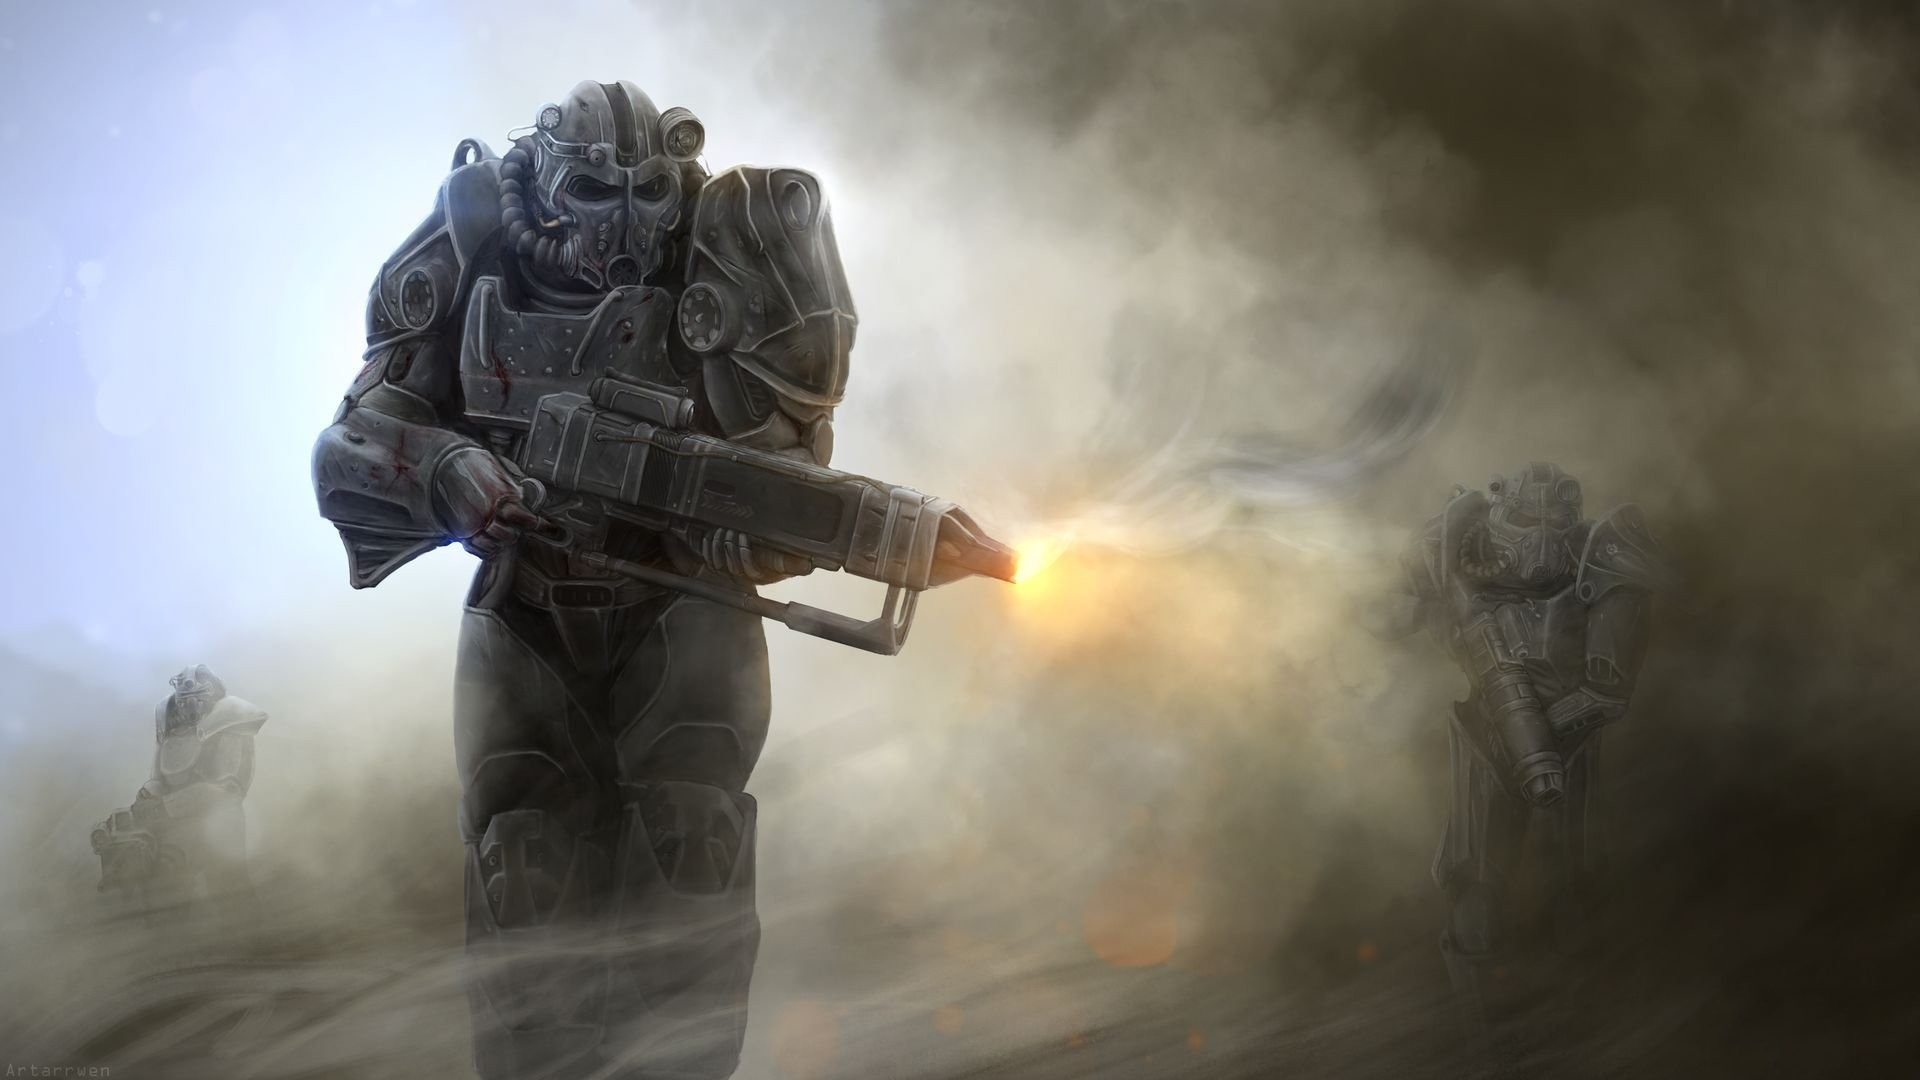 fallout 4 bethesda game studios bethesda softworks power armor apocalypse  heath armour industrial complex boston ma